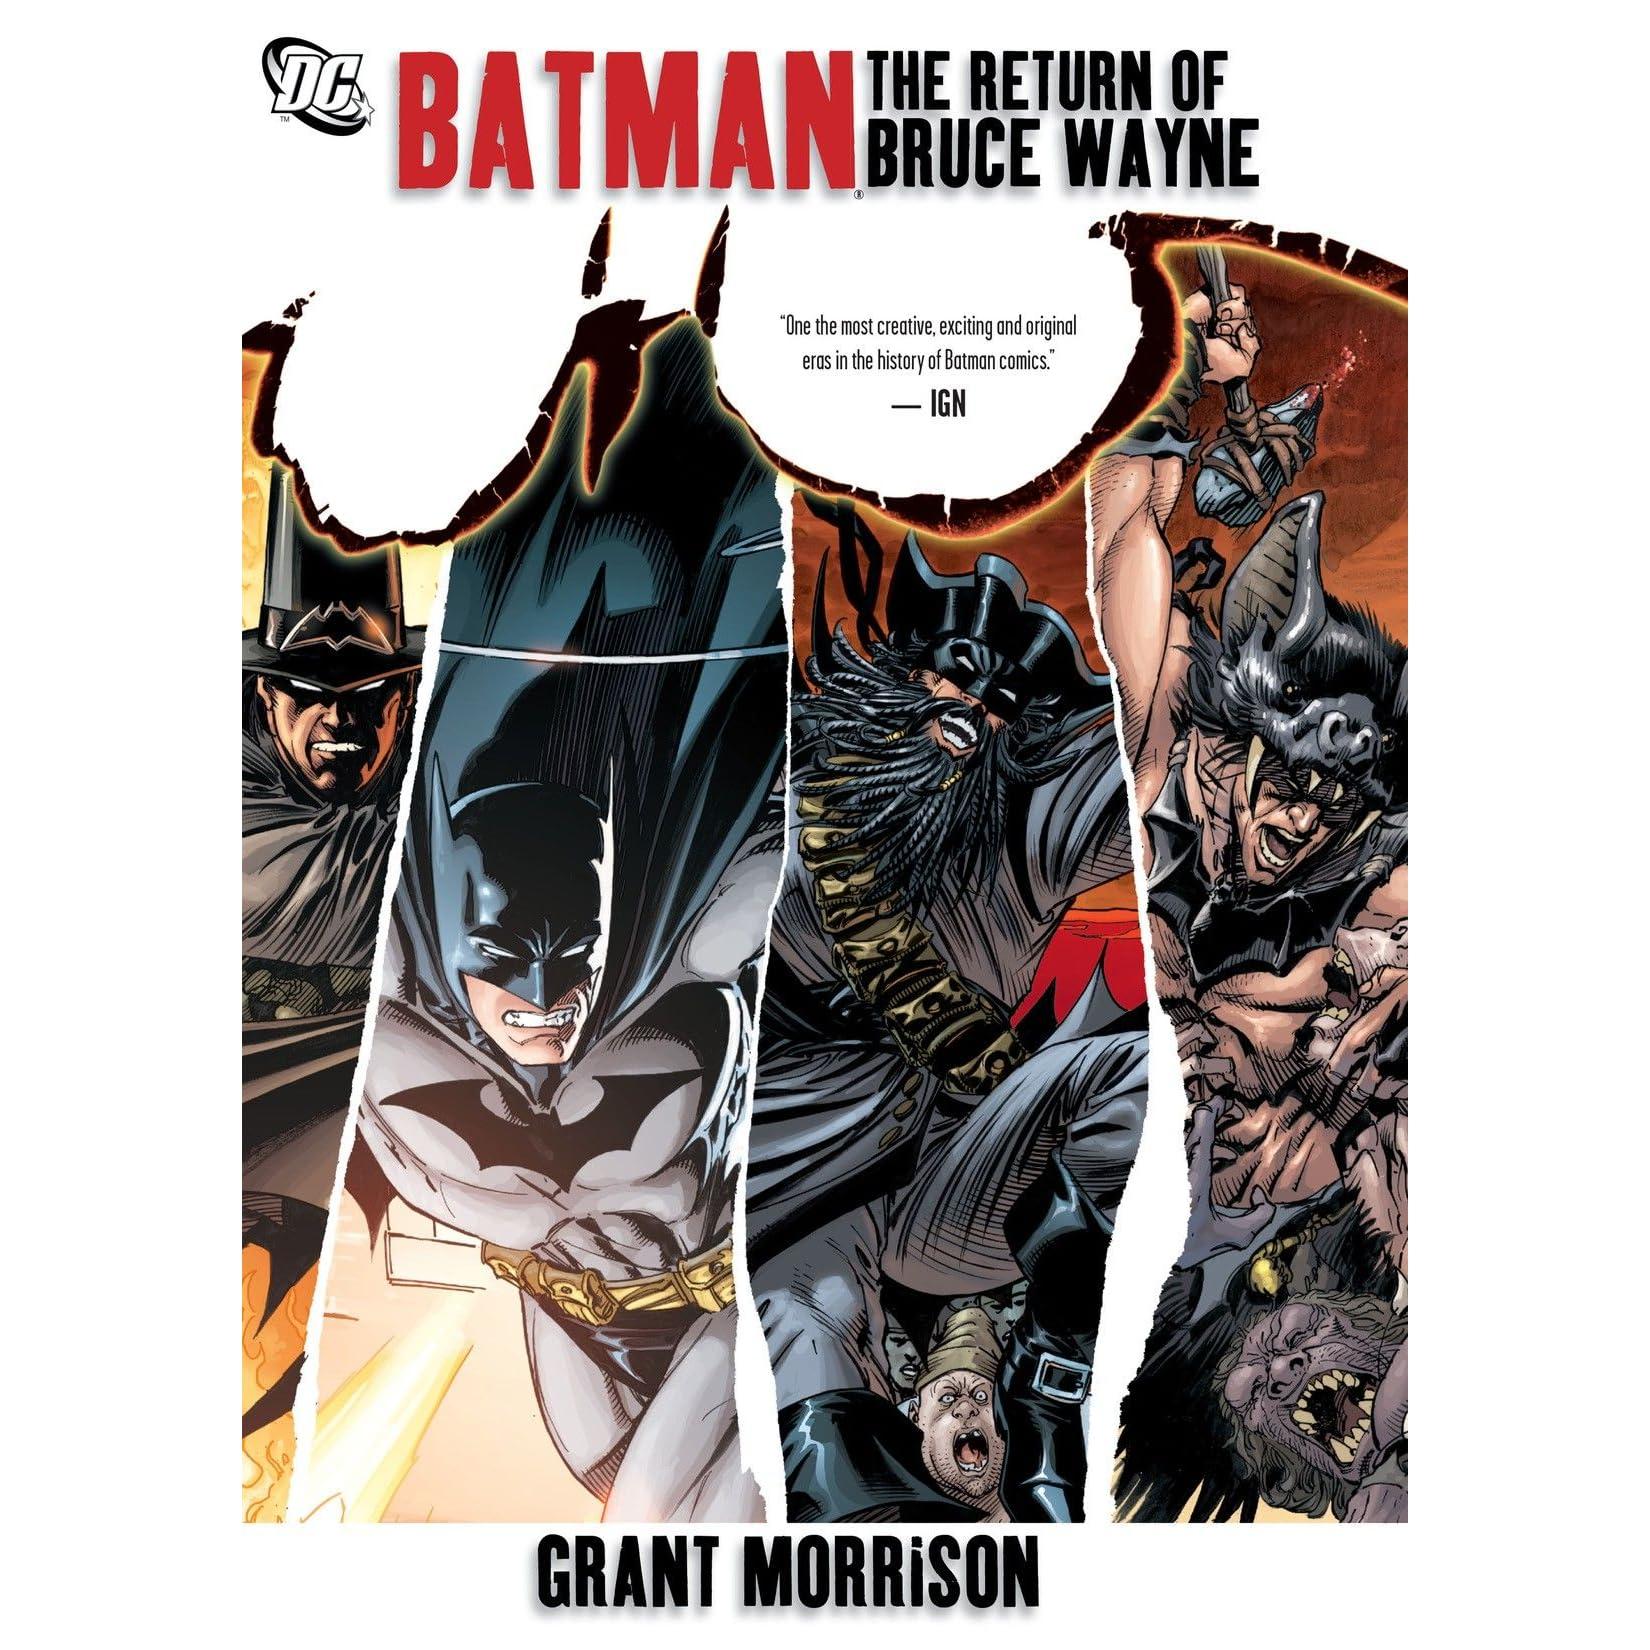 Batman: The Return of Bruce Wayne by Grant Morrison